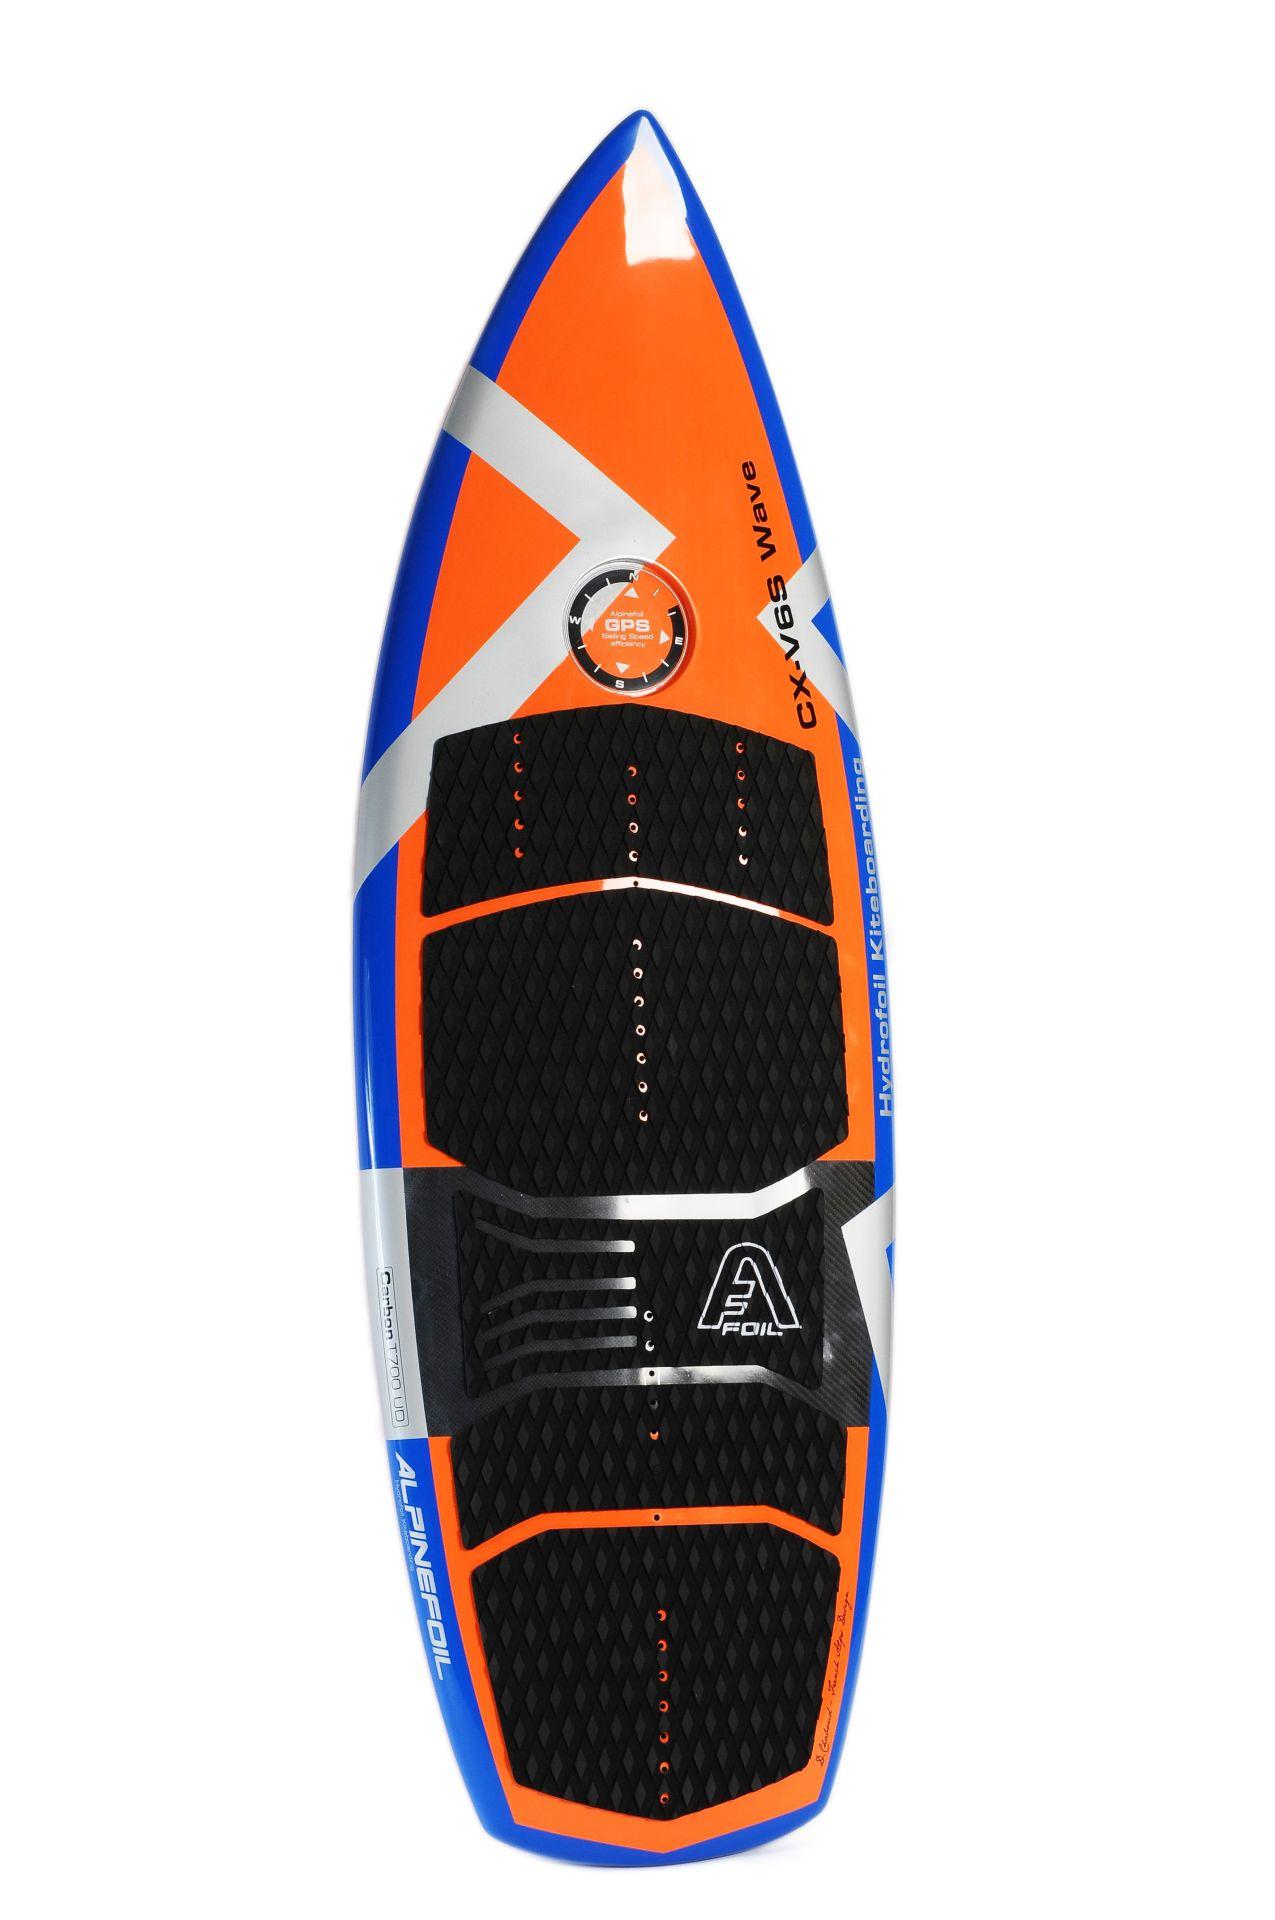 Kitefoil board alpinefoil cx v6 wave convertible 4243 1